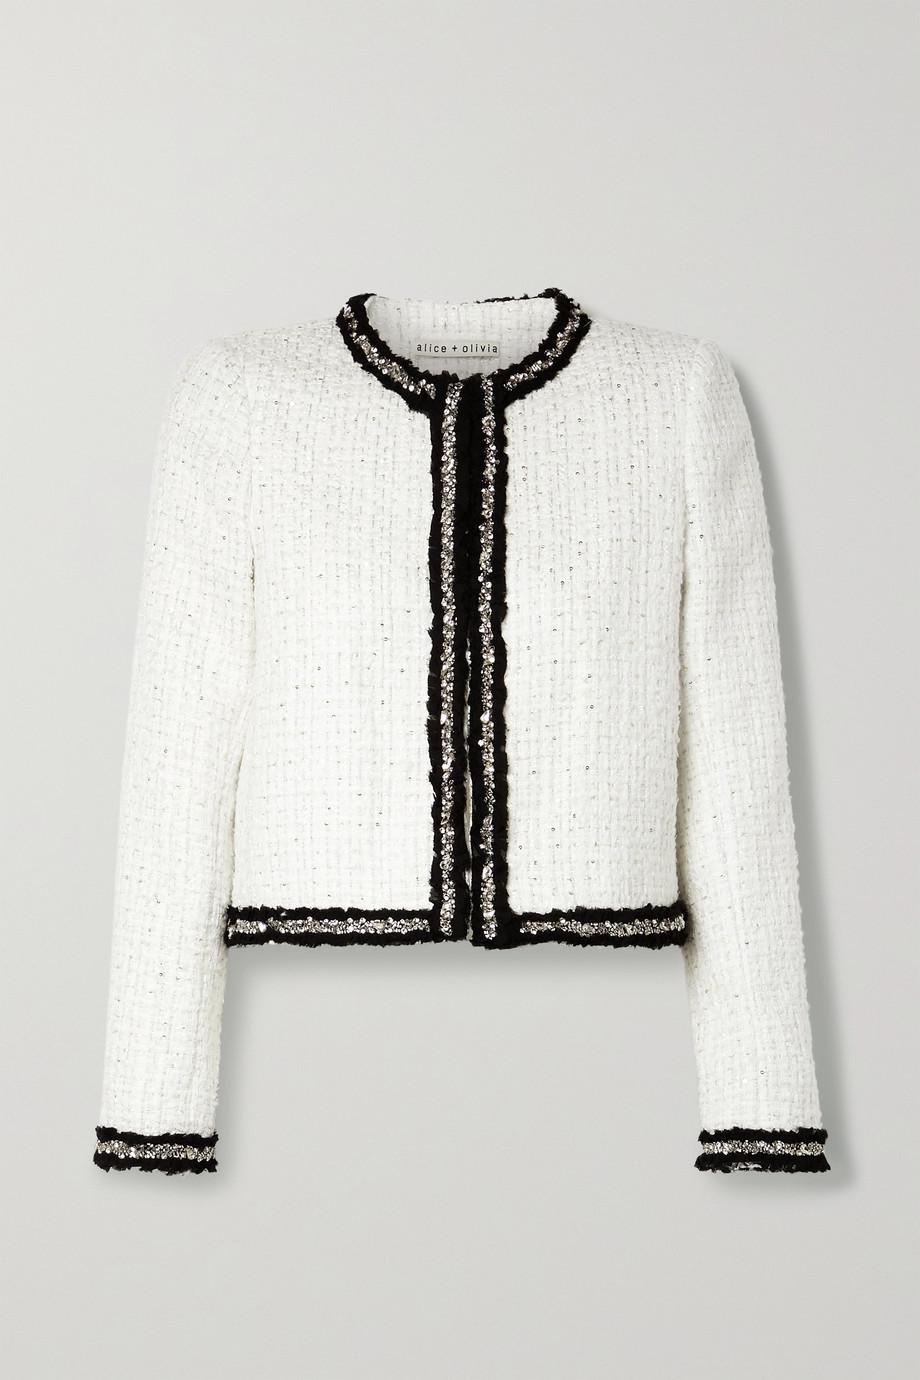 Alice + Olivia Kidman embellished metallic tweed jacket